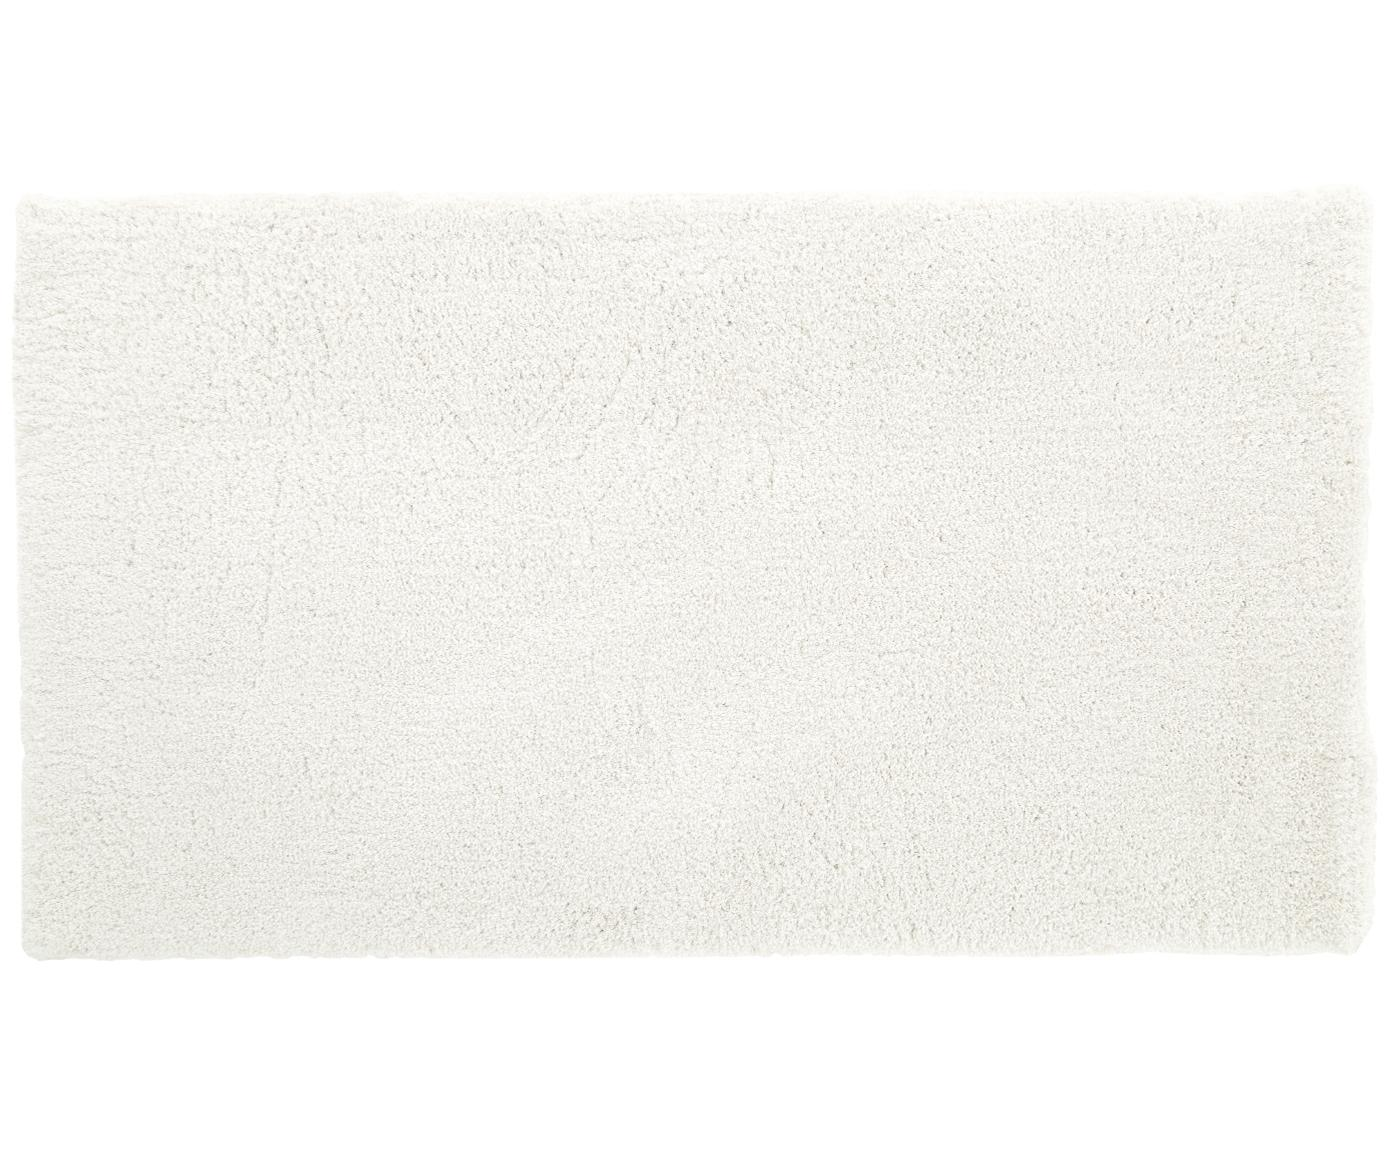 Flauschiger Hochflor-Teppich Leighton in Creme, Flor: 100% Polyester (Mikrofase, Creme, B 80 x L 150 cm (Grösse XS)